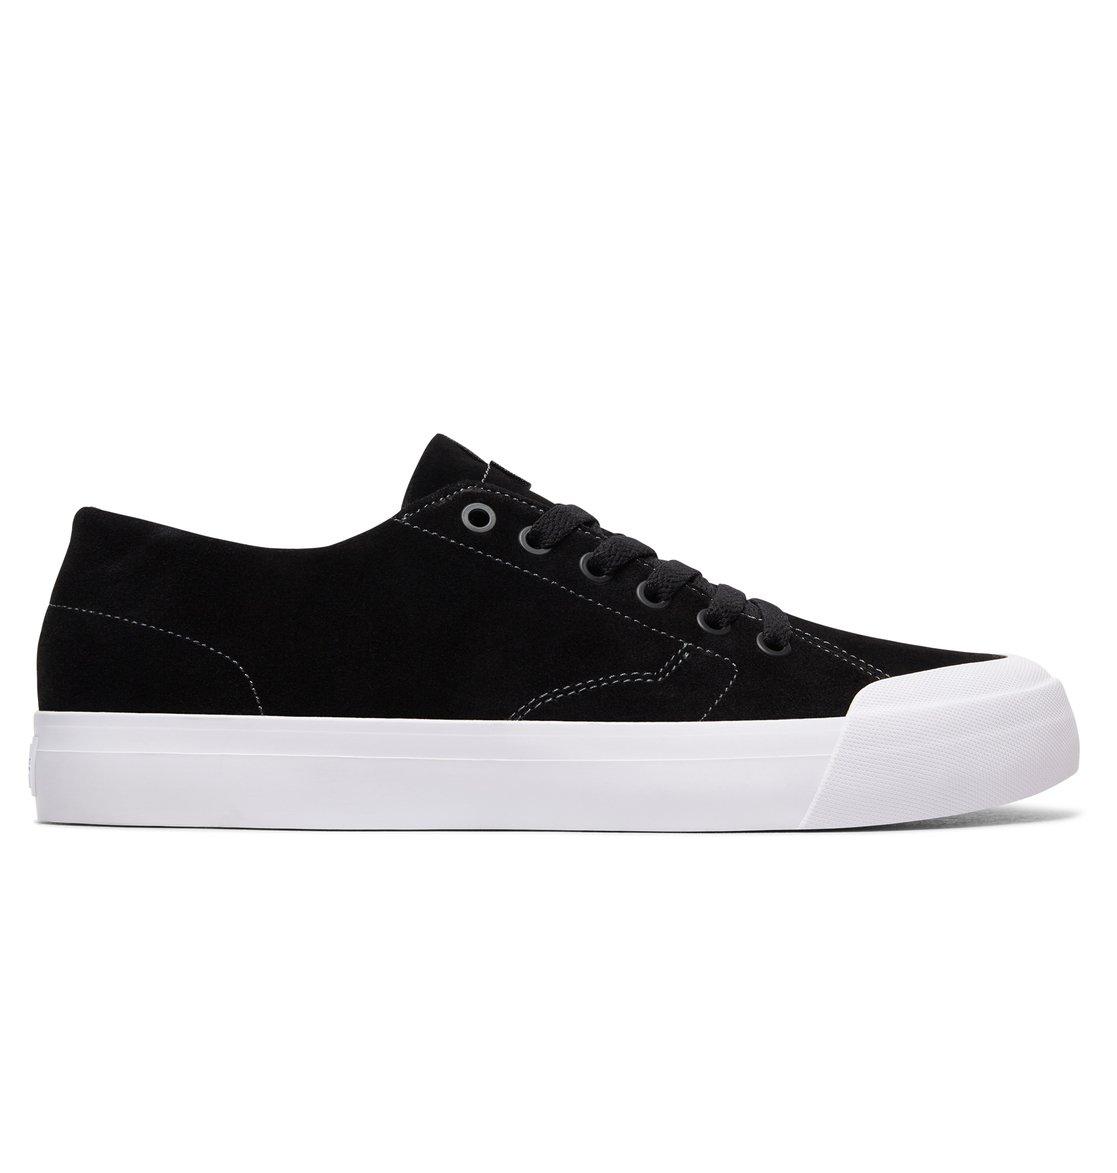 Zeros Shoe Store